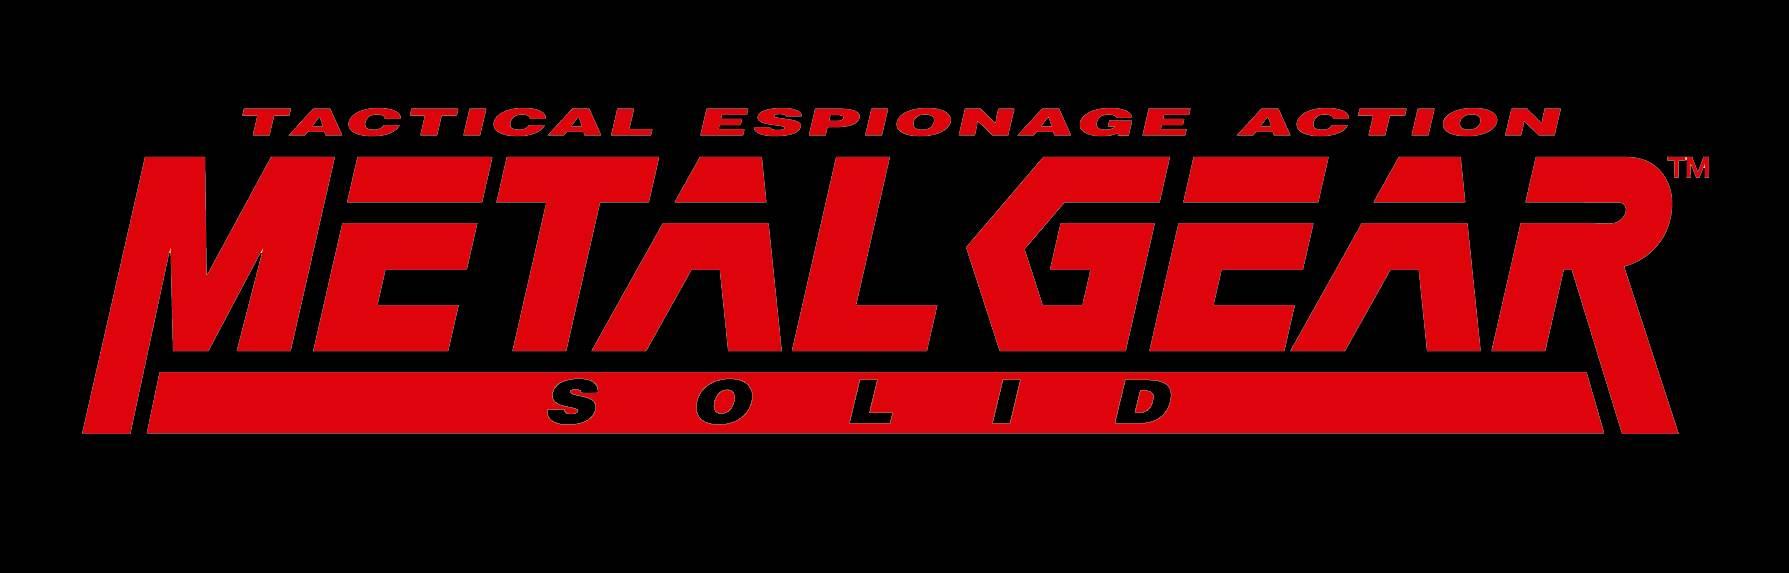 metal-gear-solid-logo